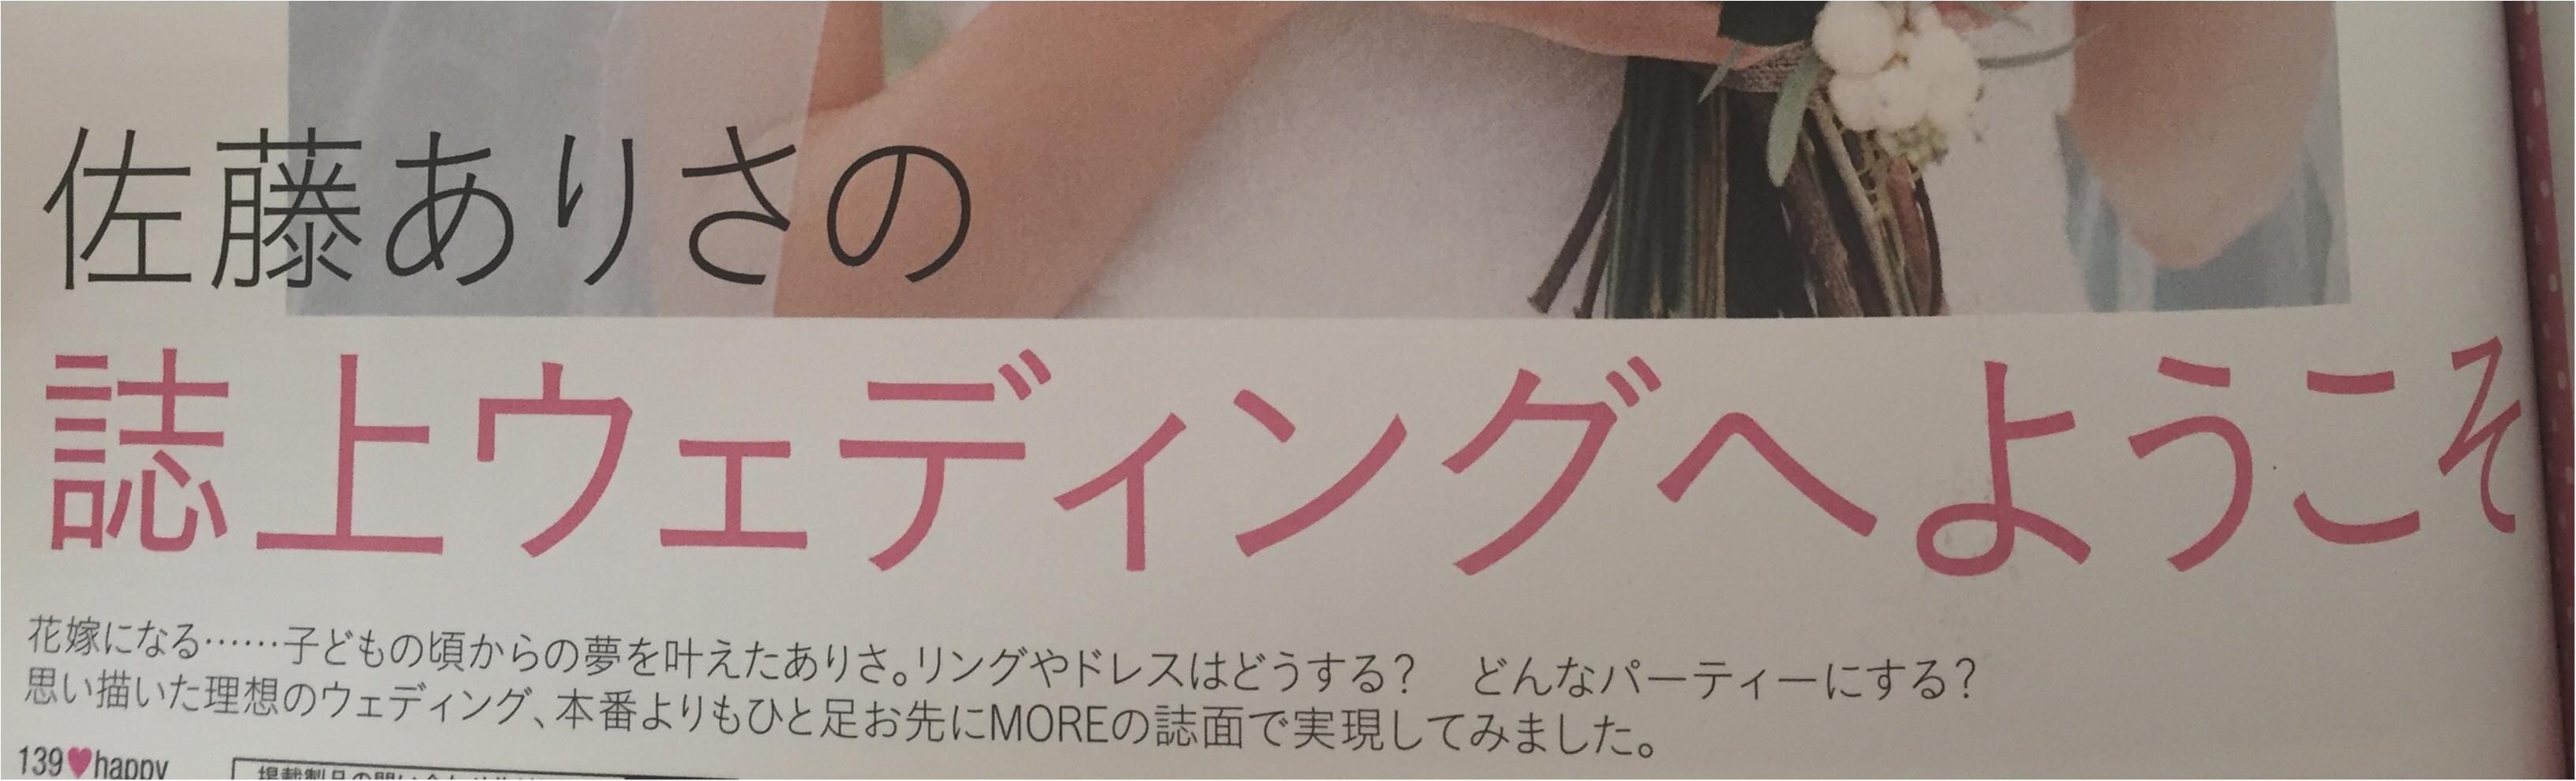 【MORE12月号☆発売中】特別付録はCOACHステーショナリー4点セット✨≪samenyan≫_10